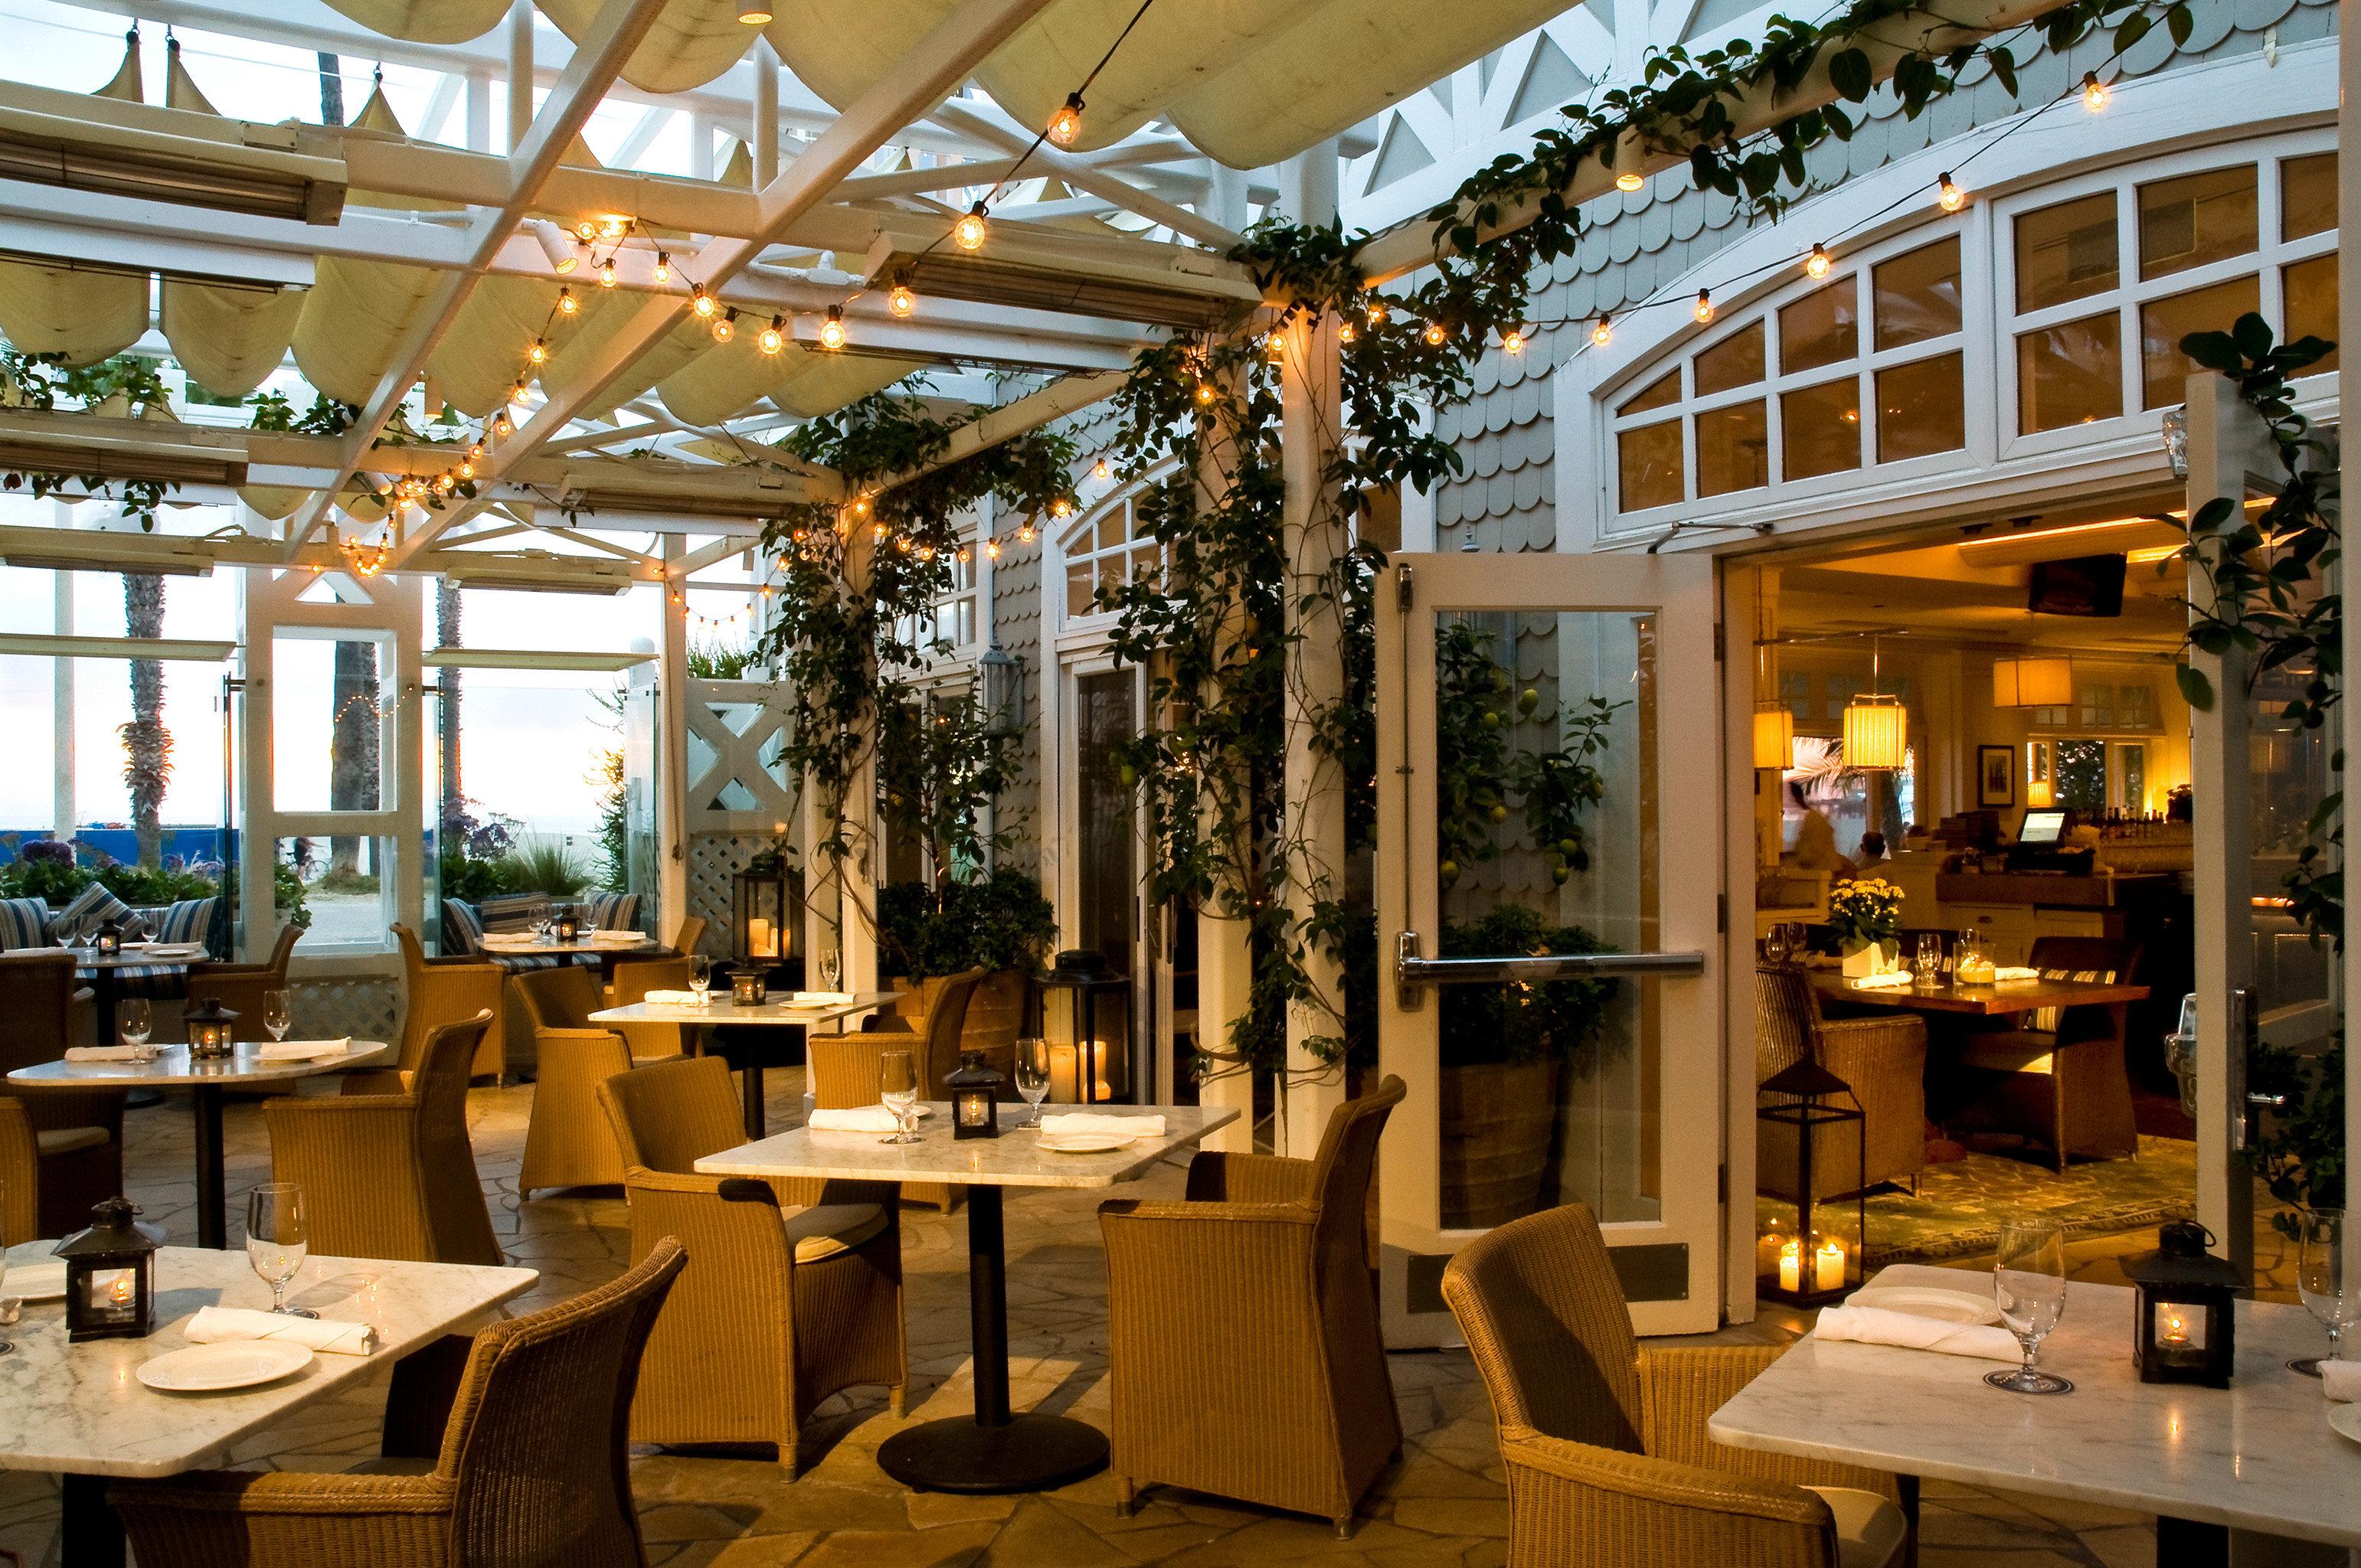 Bar Dining Drink Eat Luxury Modern building restaurant Resort home café